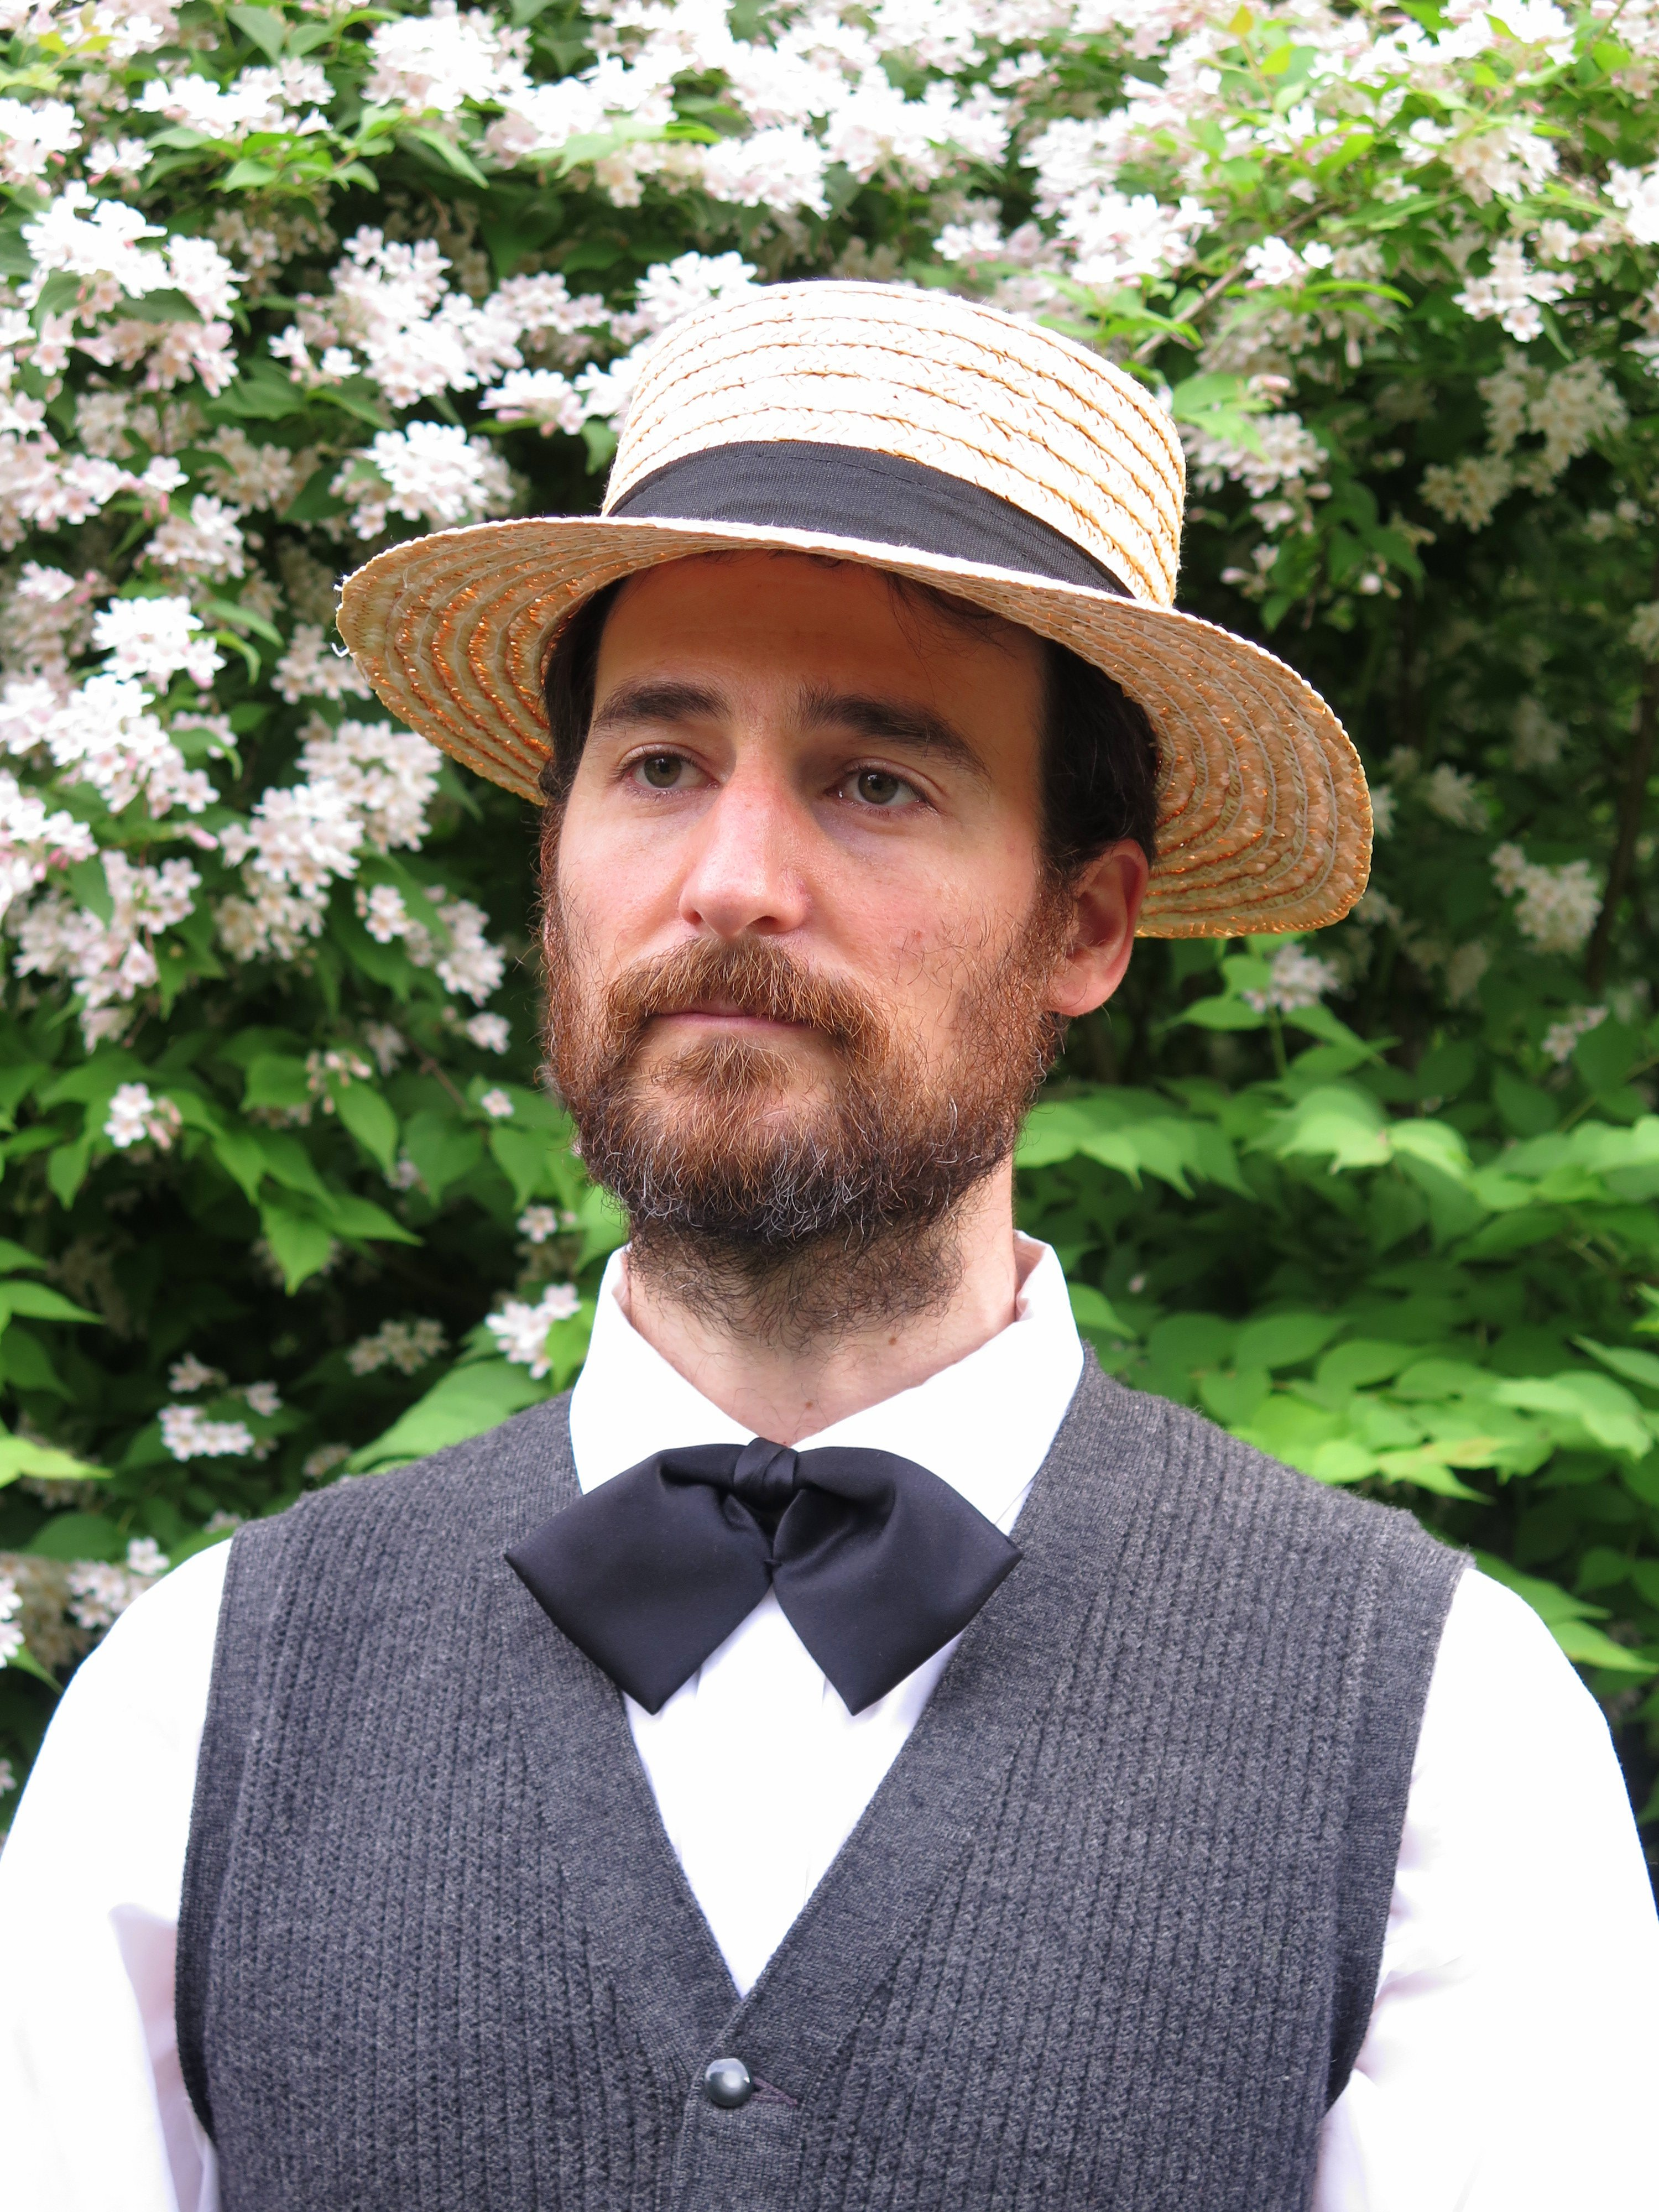 Brent Ranalli as Henry David Thoreau